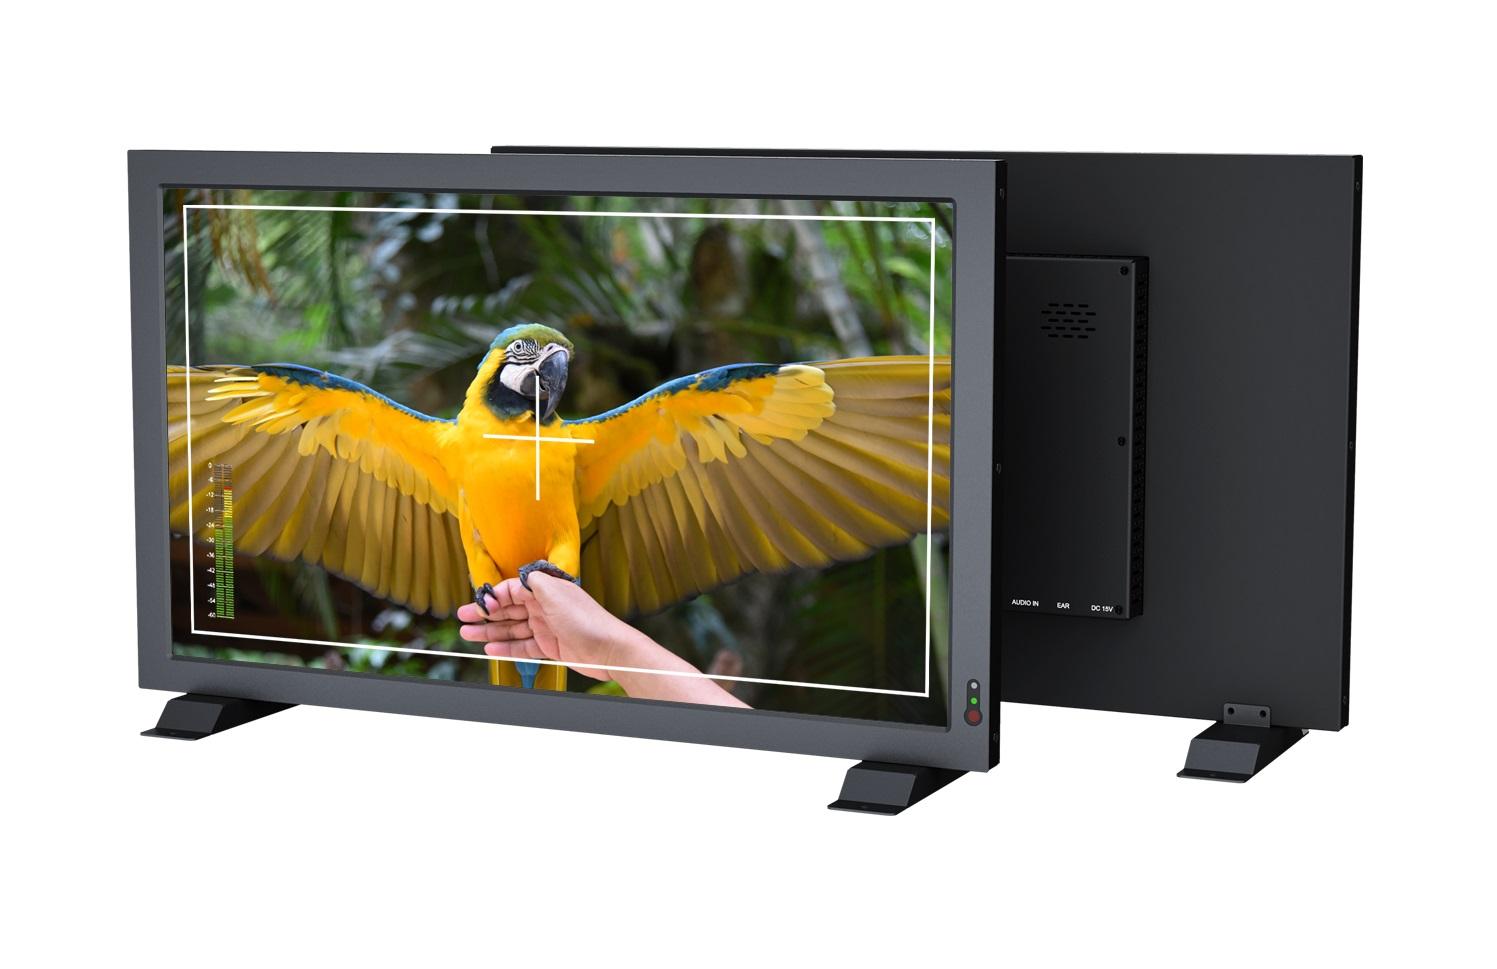 Artikelfoto Lilliput 21.5 Zoll PRO HDMI Monitor High Brightness PVM210